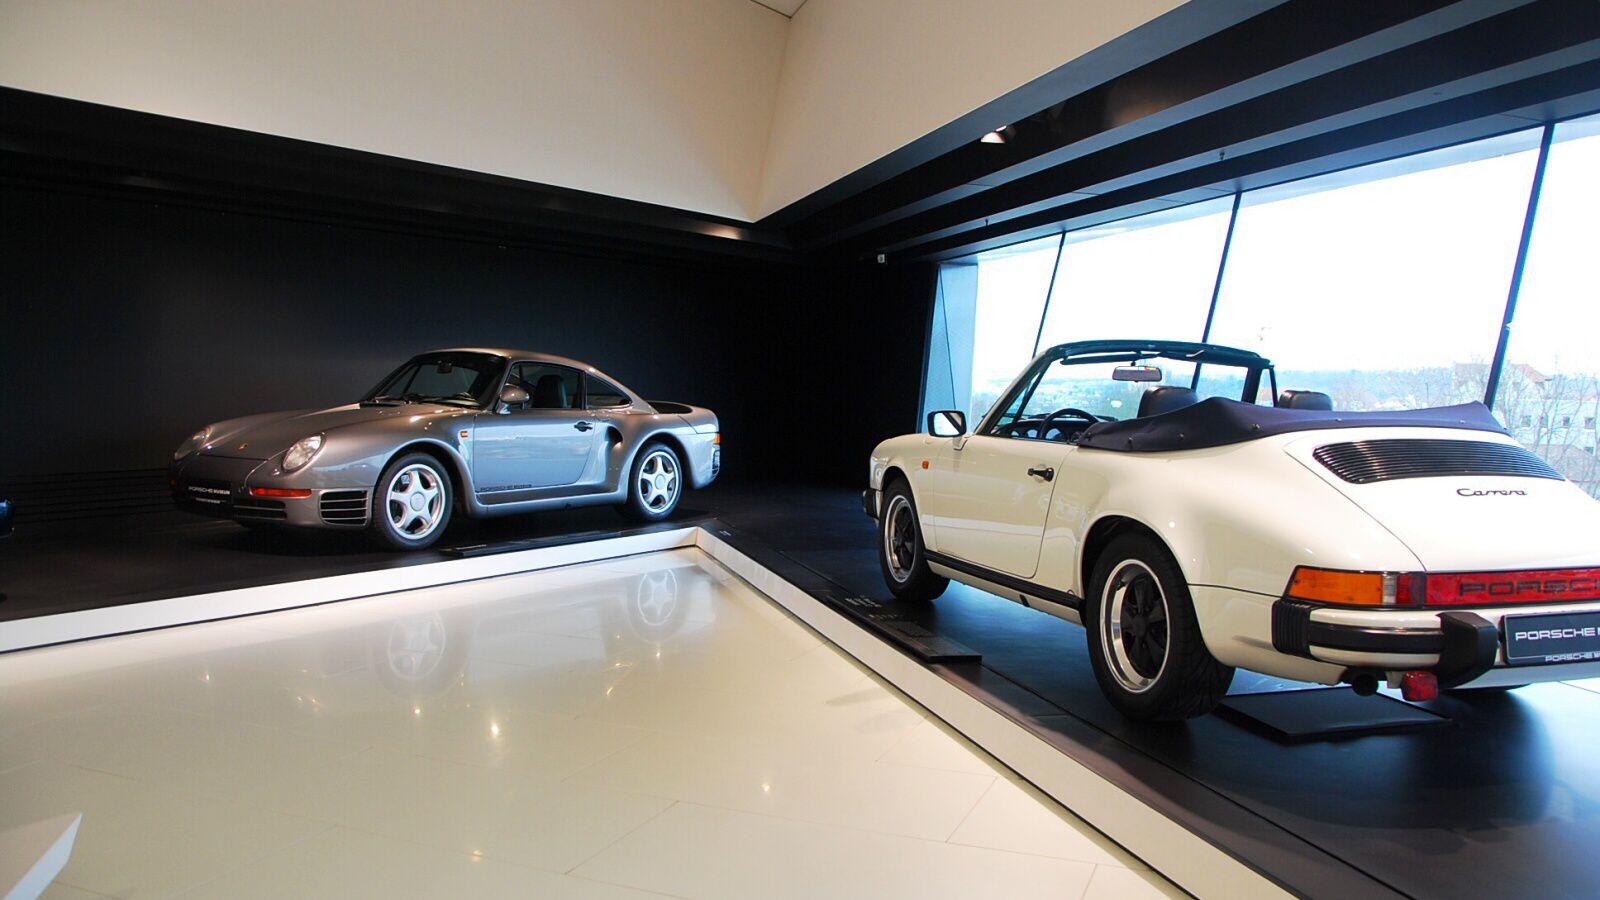 Porsche 959 a 911 Carrera Cabrio v budově mueza